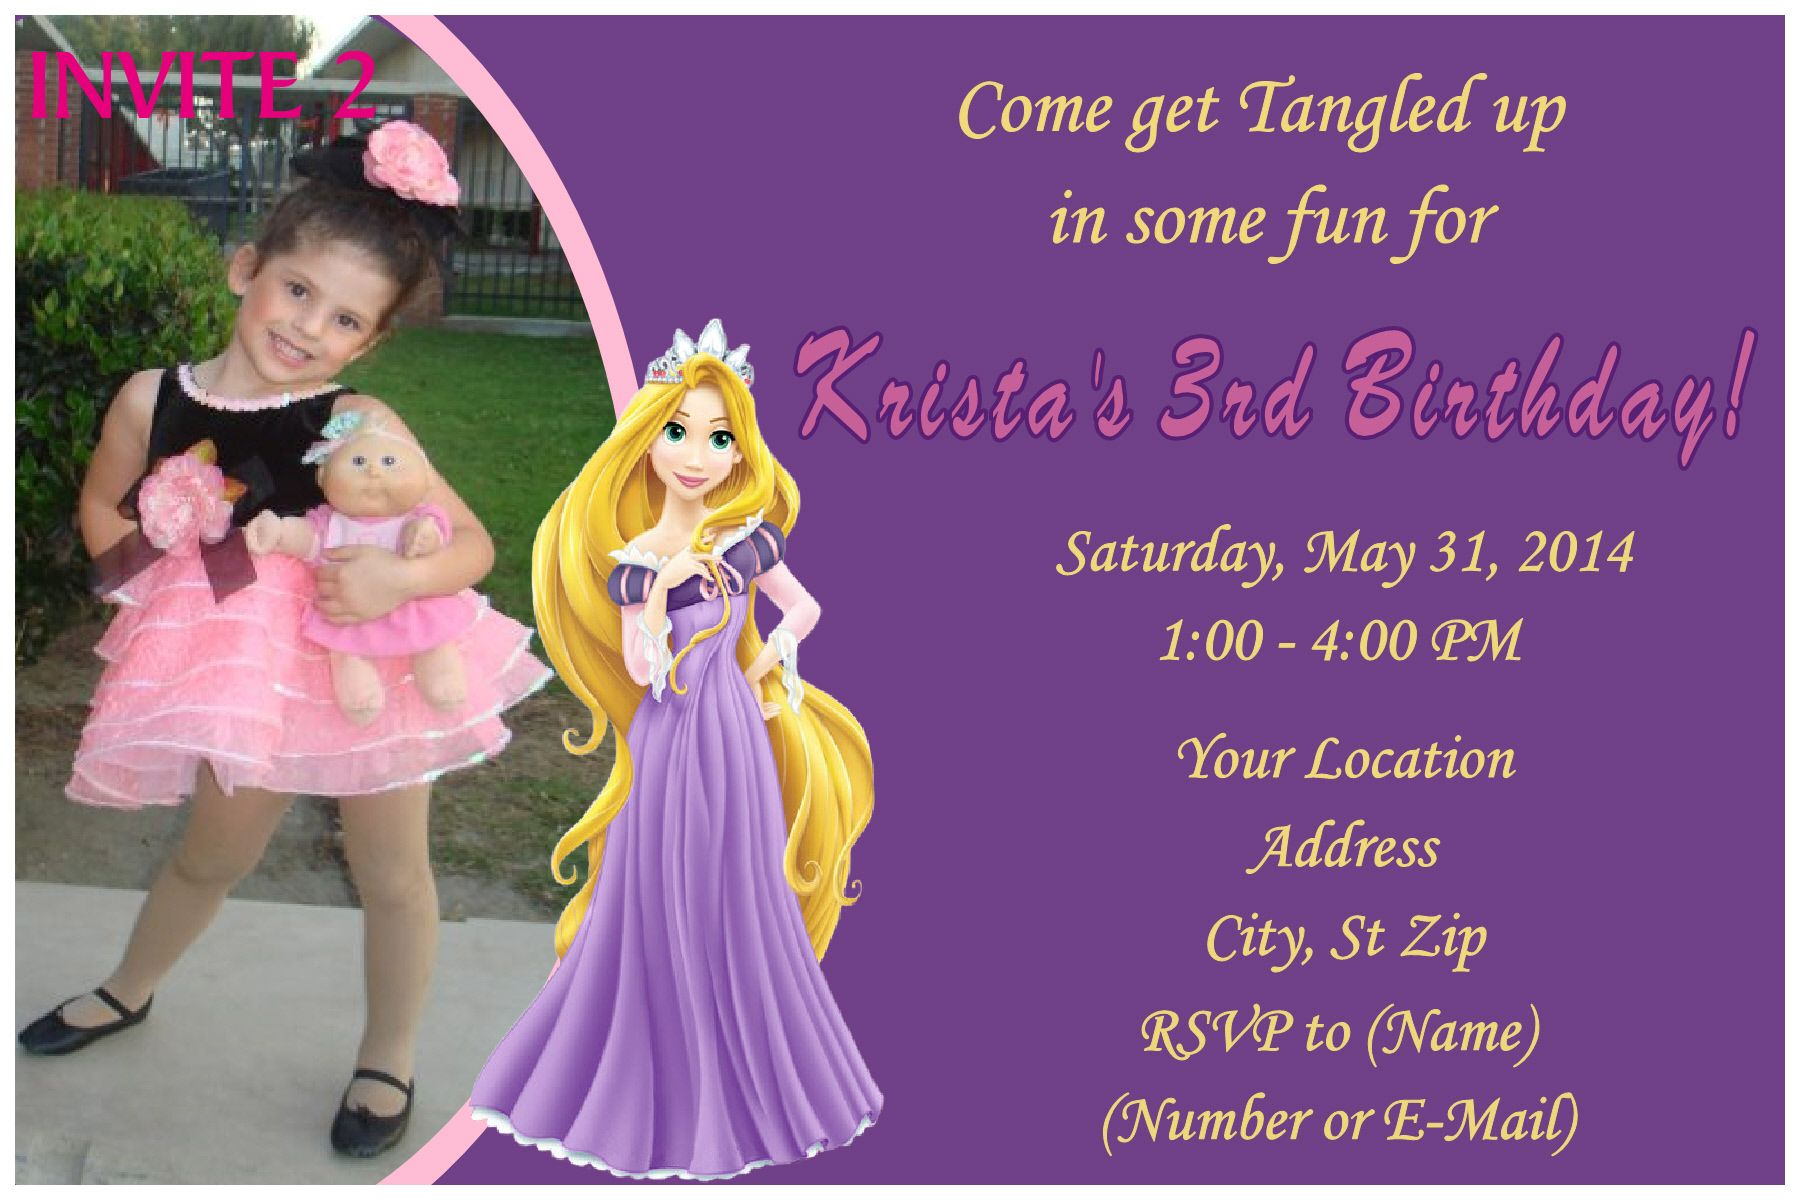 Rapunzel Tangled Birthday Invitation on the image twice to